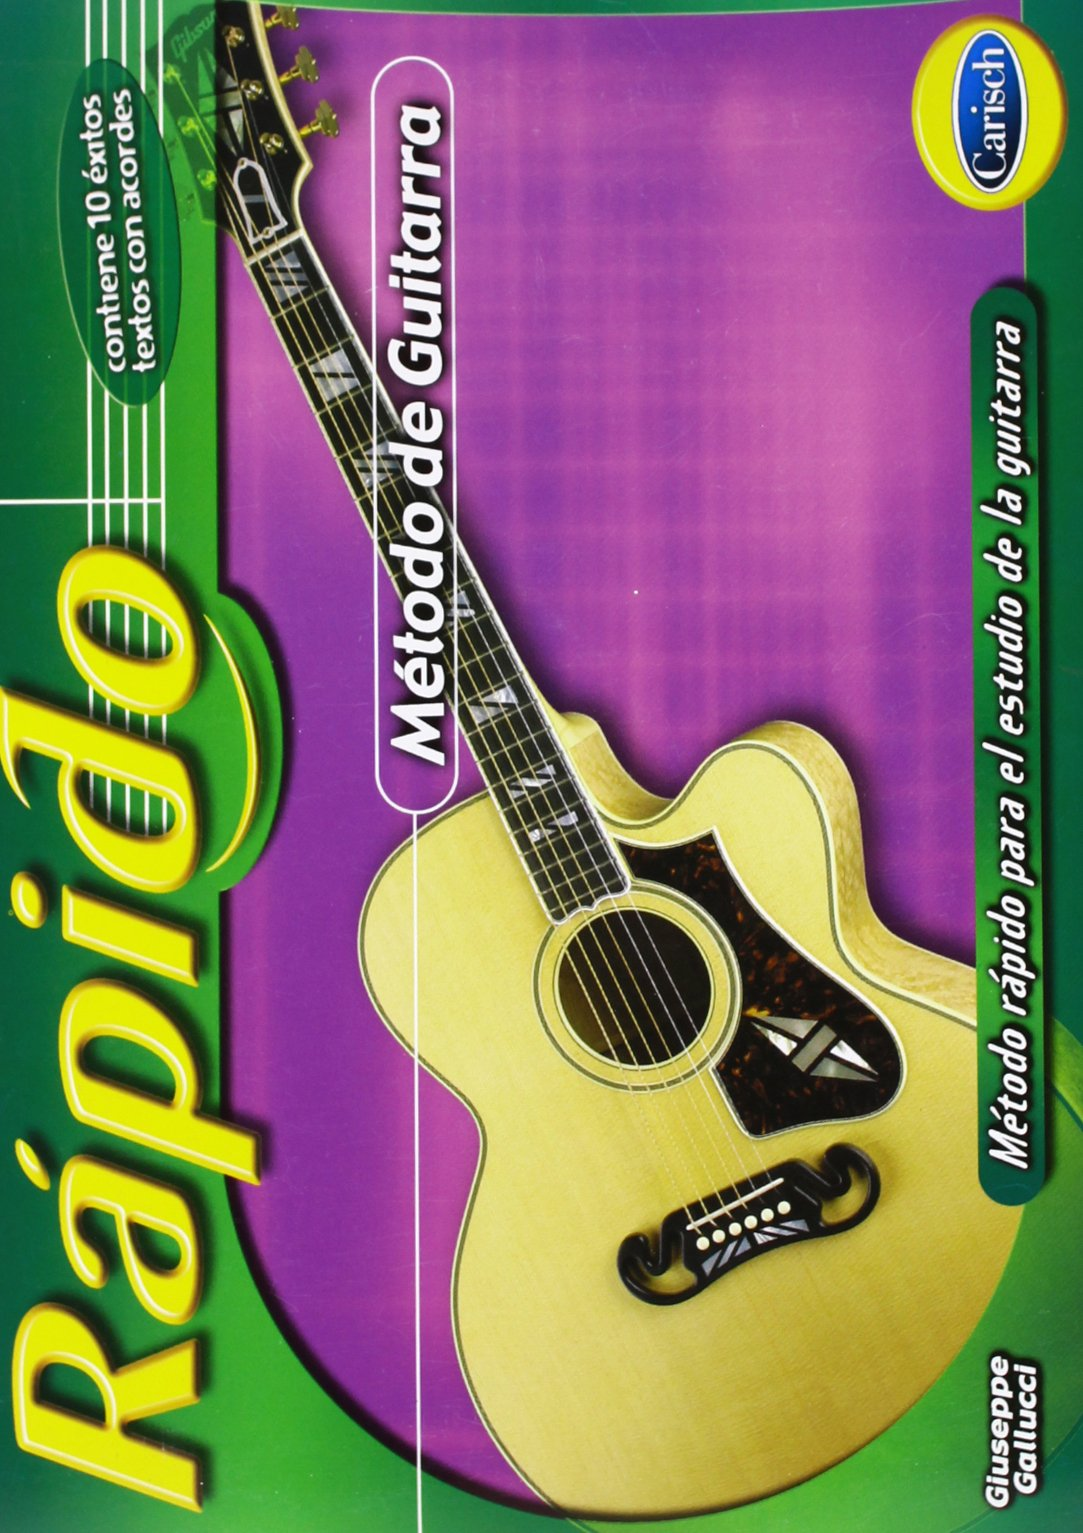 Rapido - Método de Guitarra: Amazon.es: Giuseppe Gallucci, Guitar ...